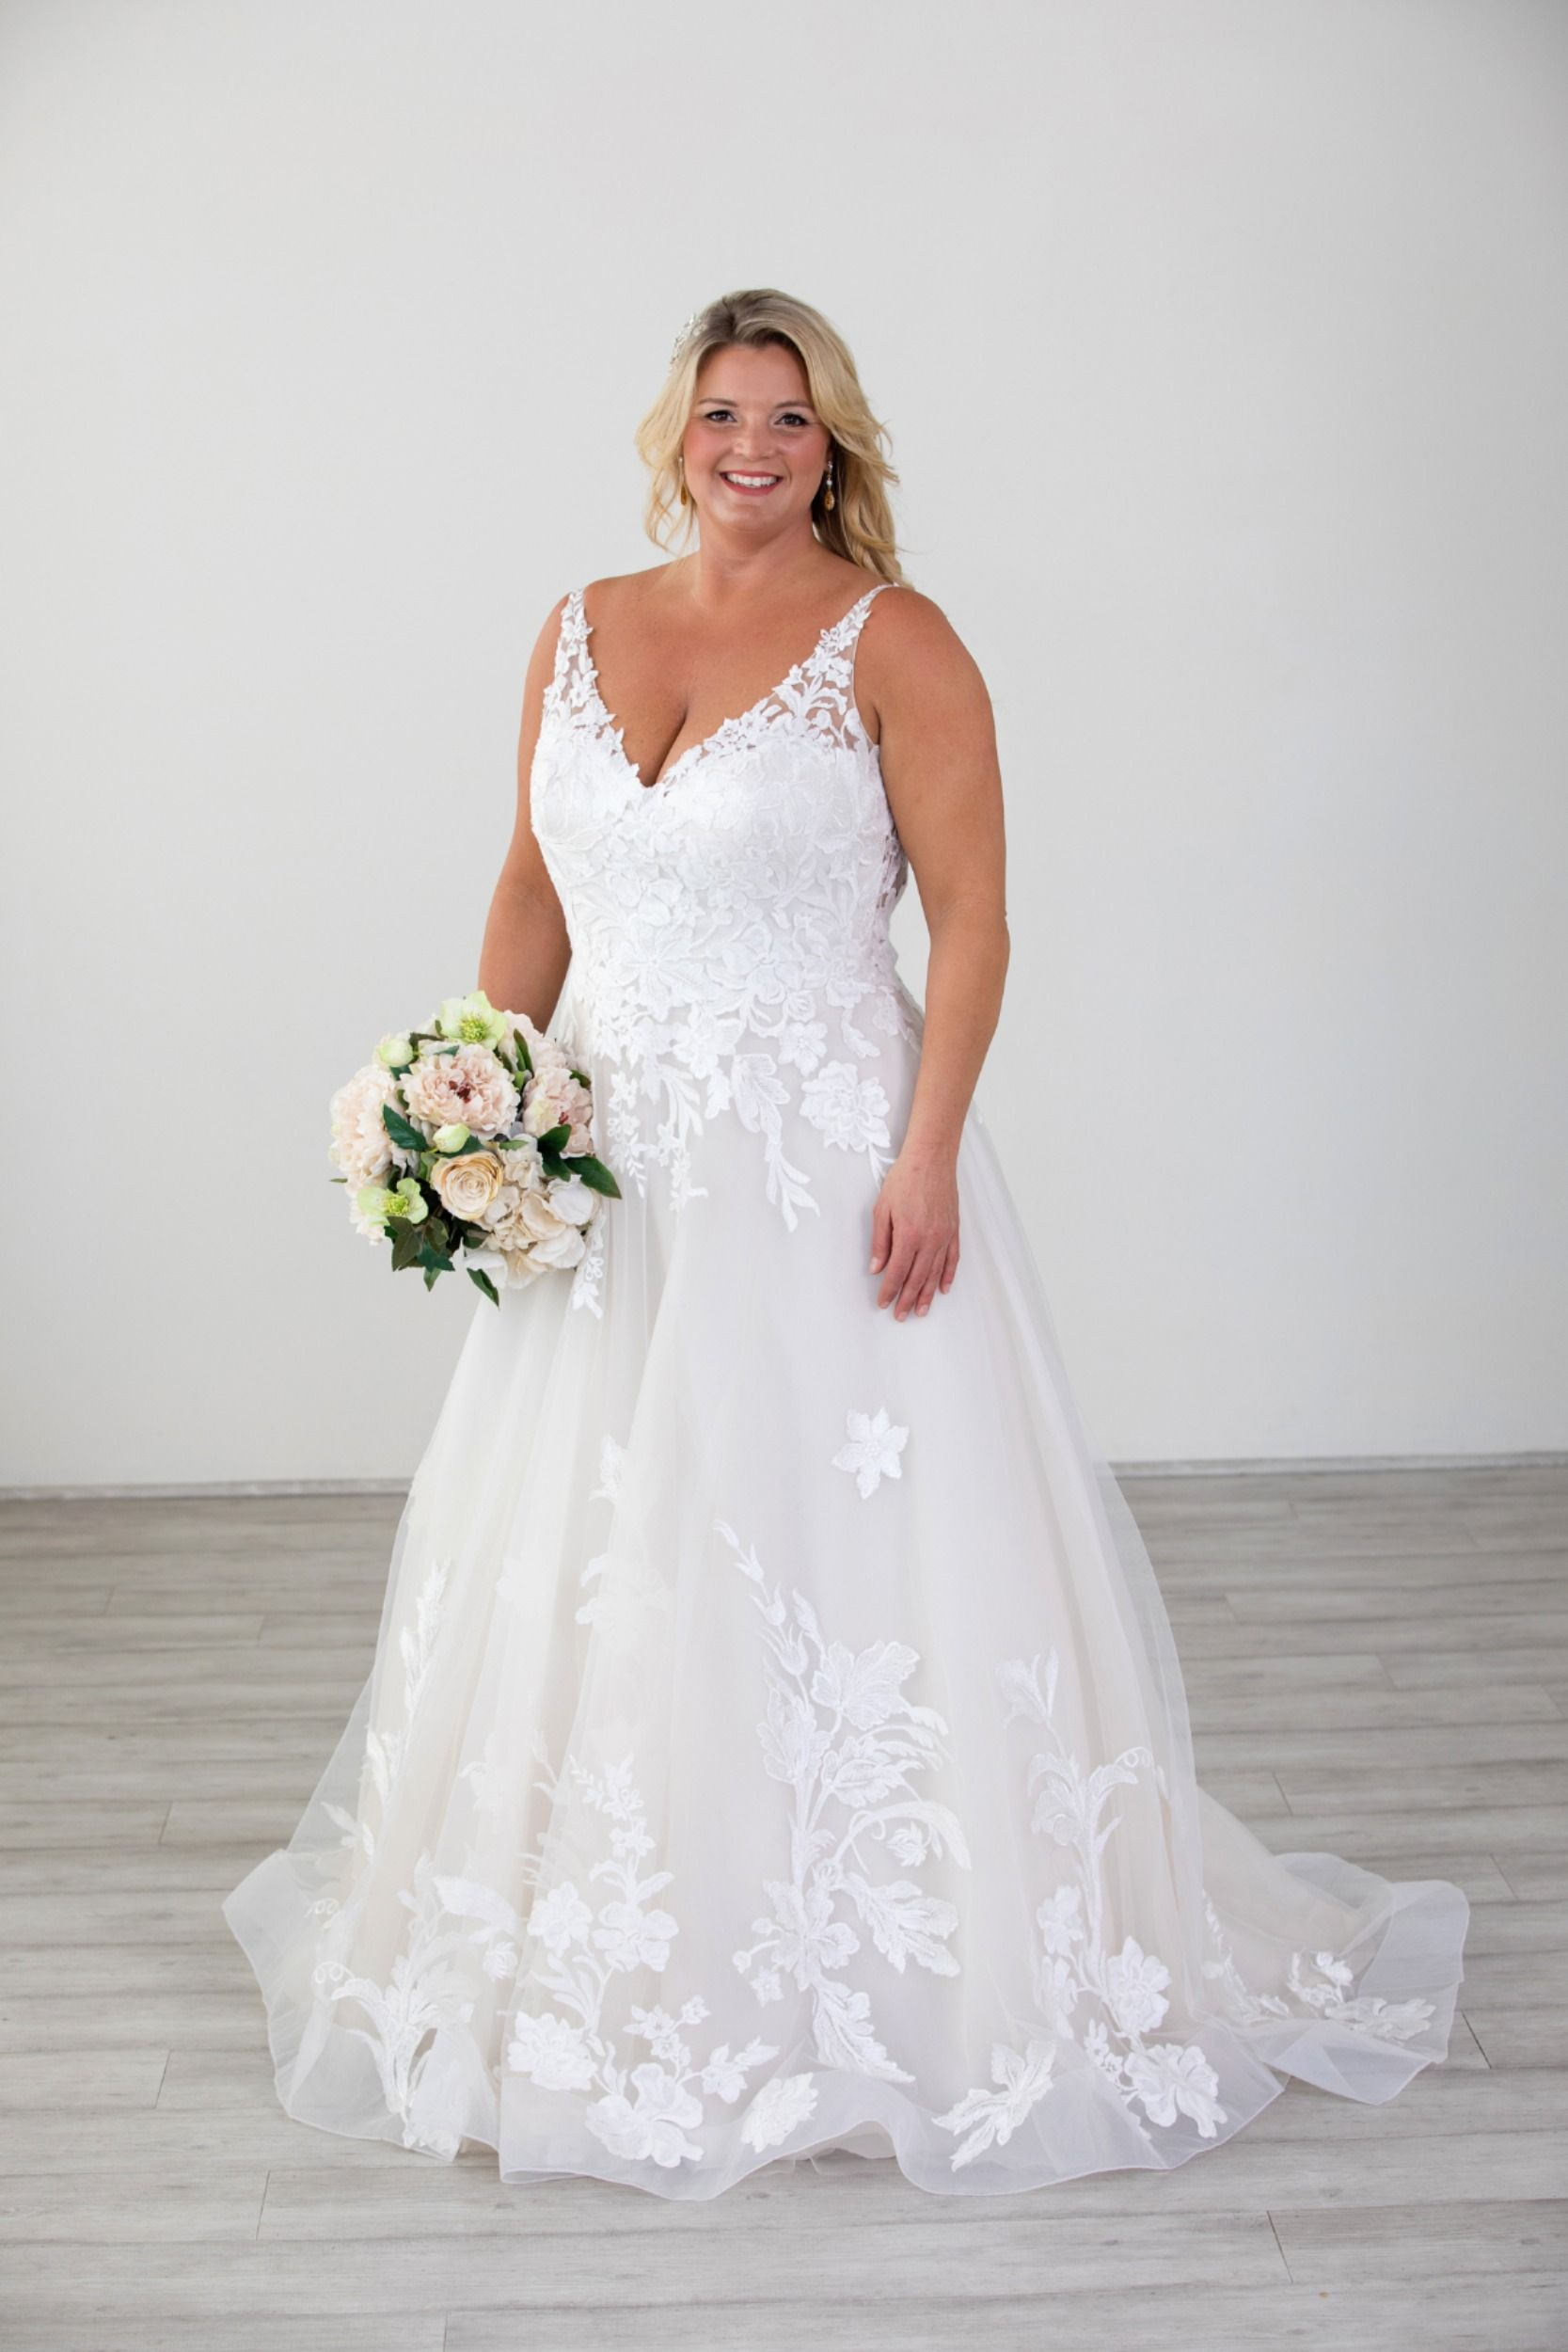 Lace V Neckline Justin Alexander Ball Gown Plus Size Wedding Gown Plus Size Wedding Gowns Wedding Dresses Dresses [ 2500 x 1667 Pixel ]